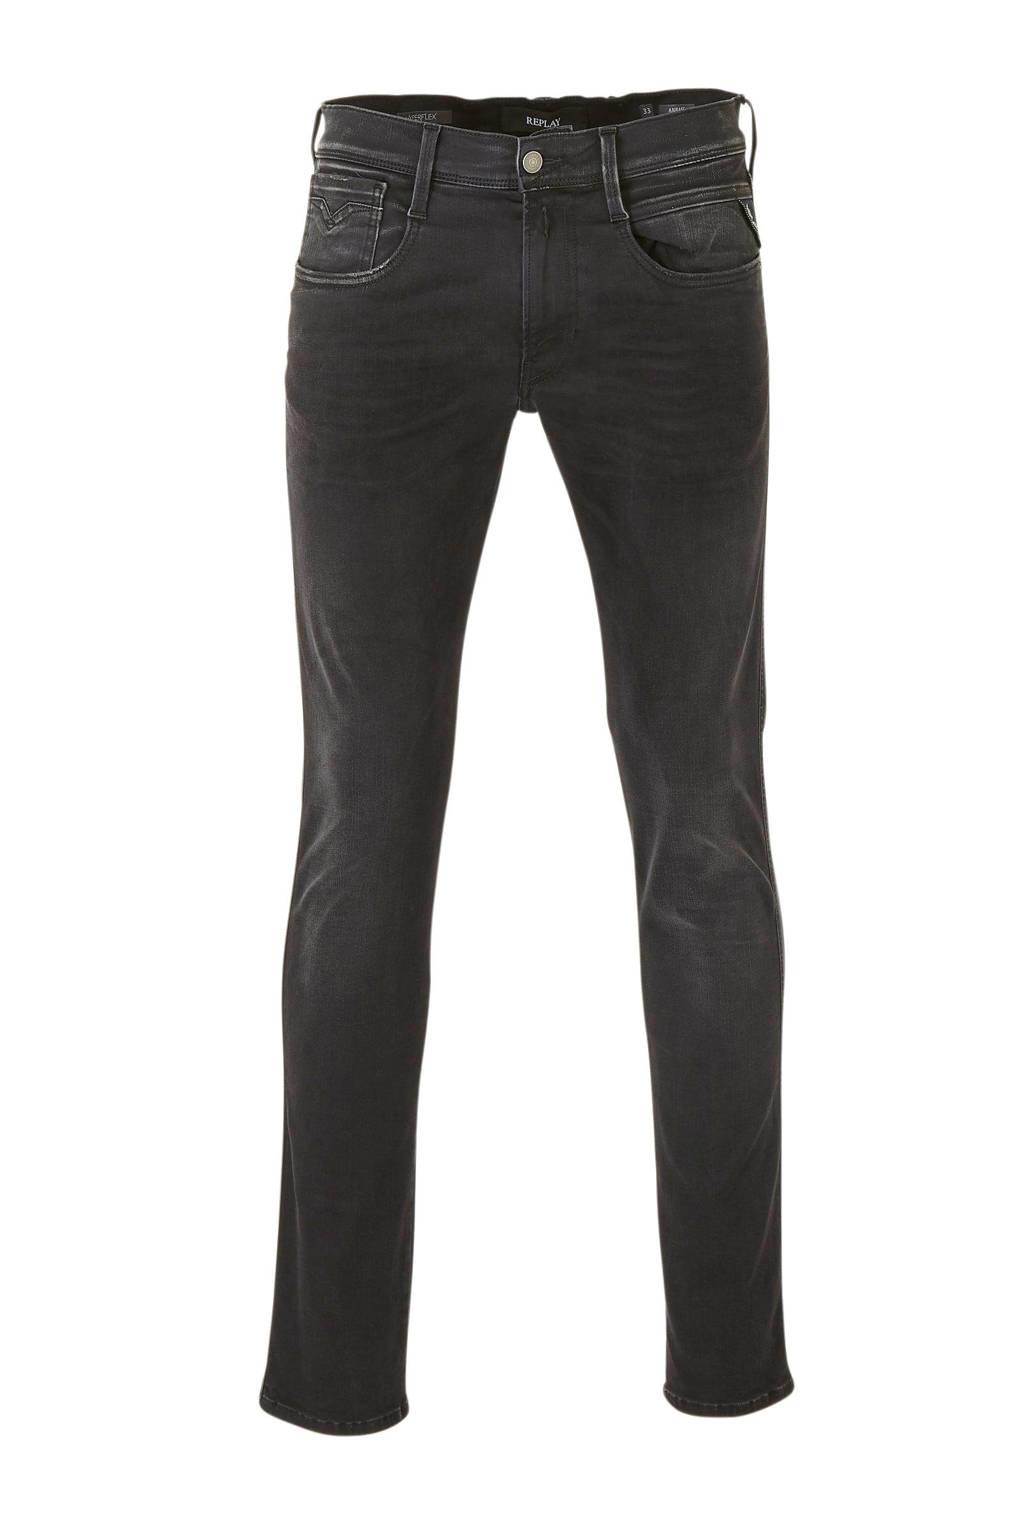 REPLAY slim fit jeans Anbass black, Black